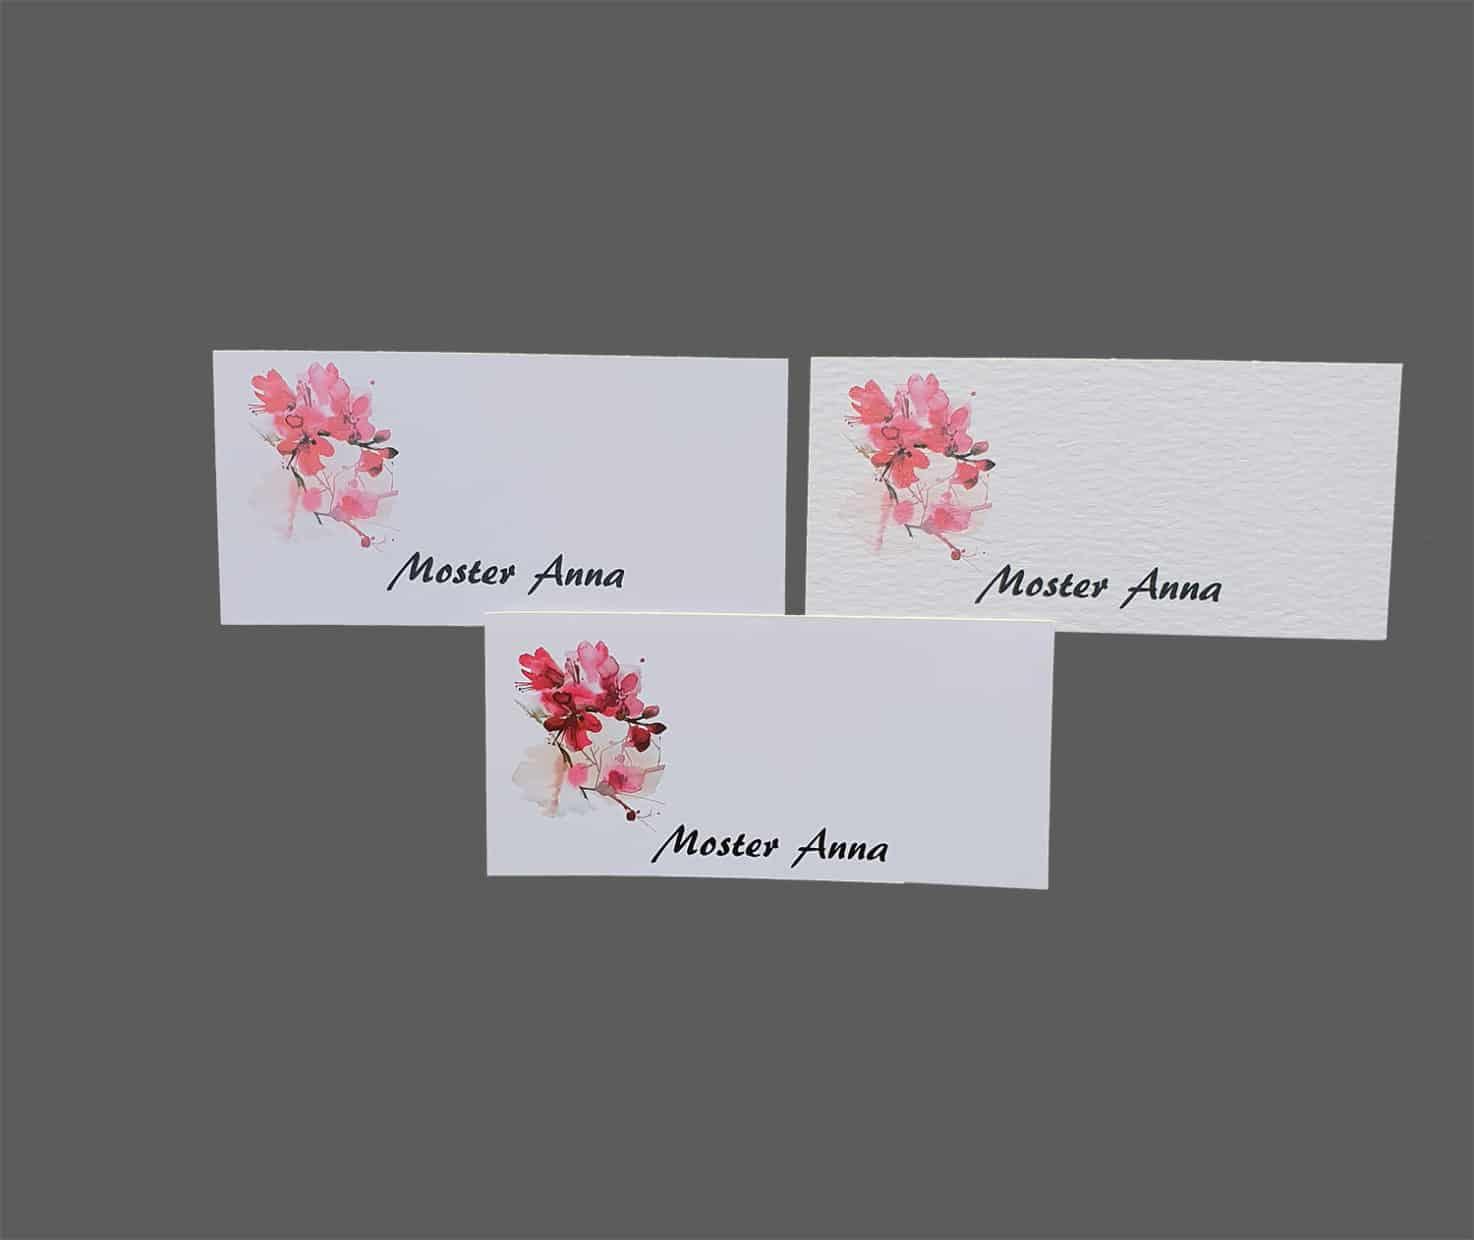 Bordkort med kirsebærblomster - print på karton